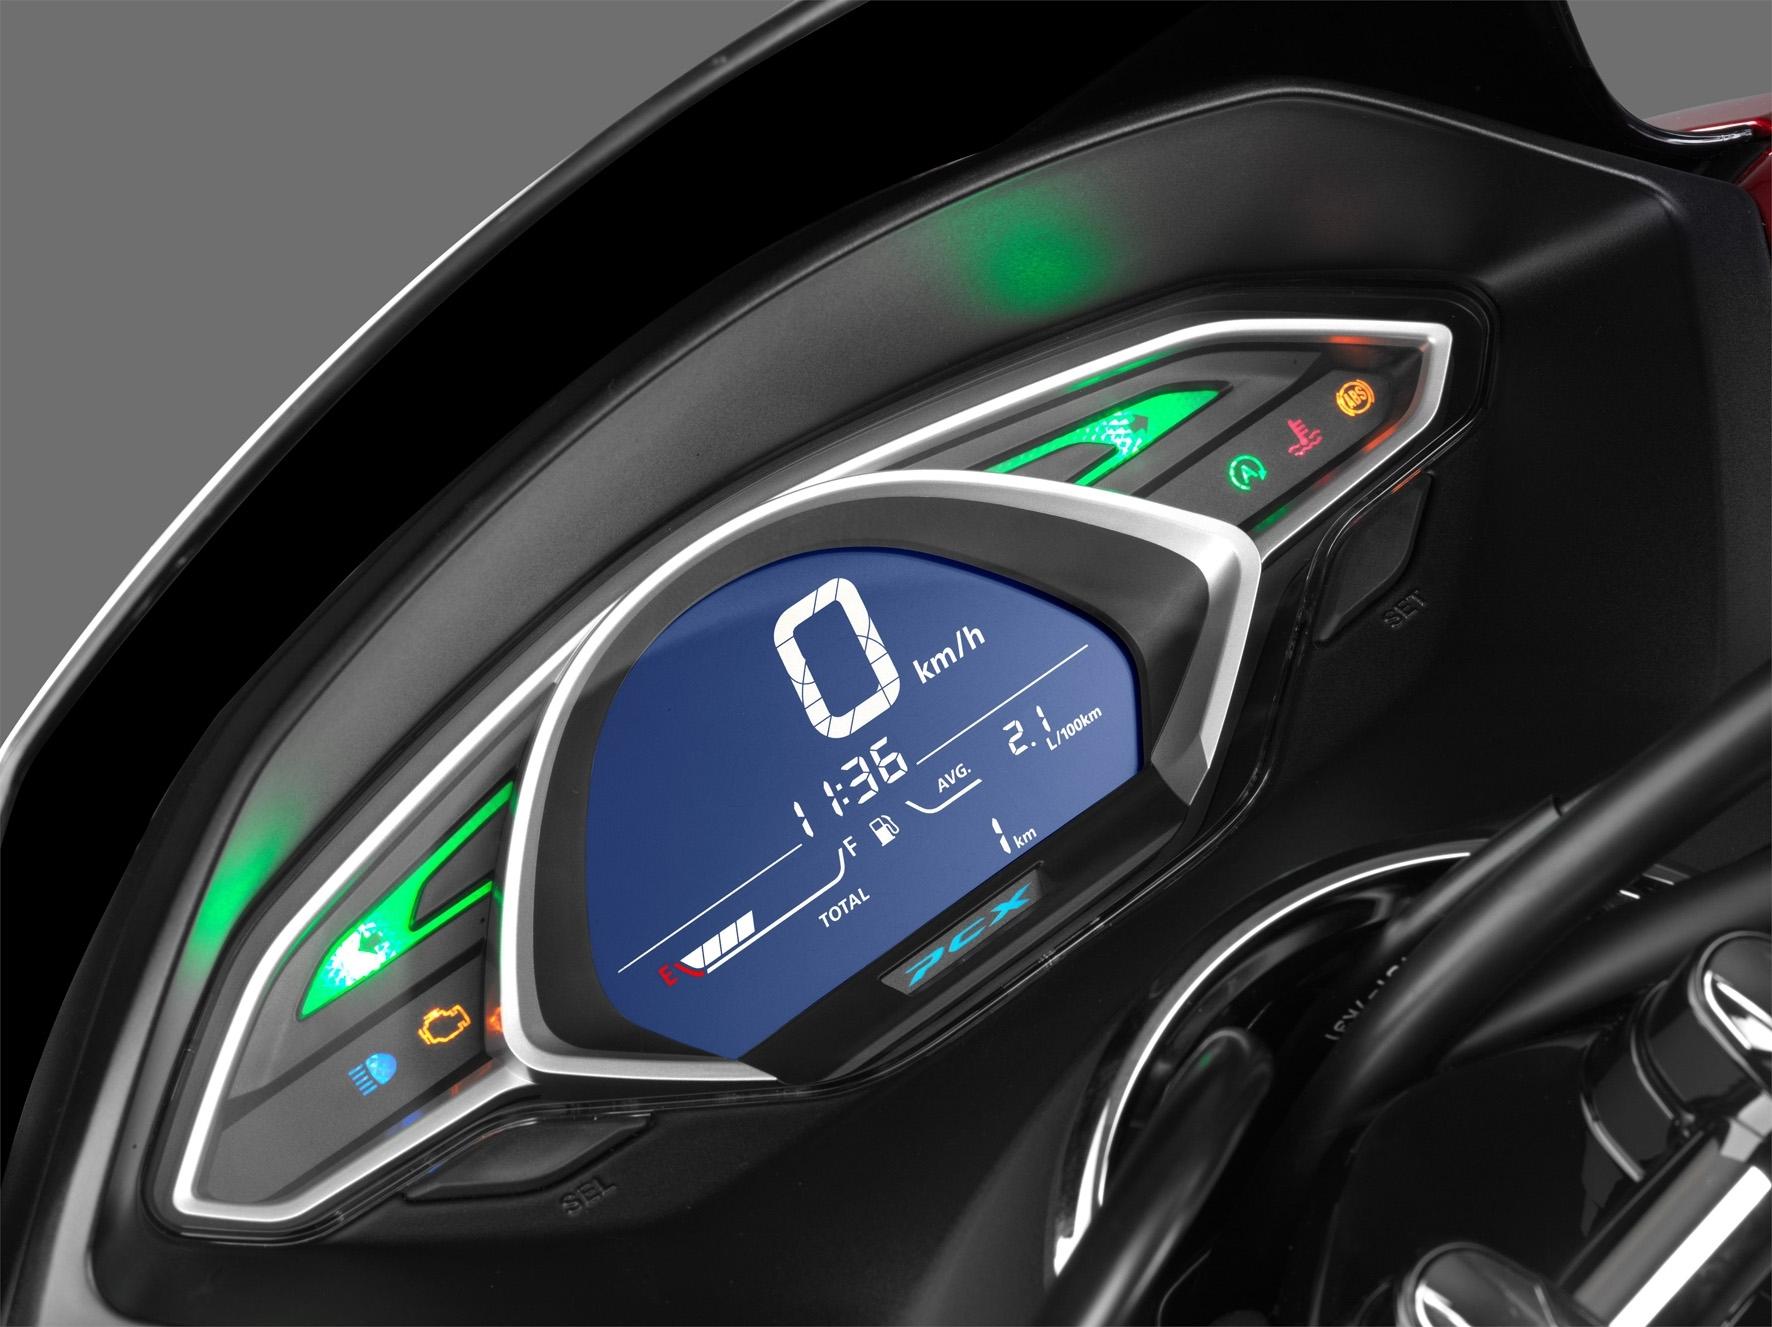 653scooter Honda Pcx2019 2019122151535